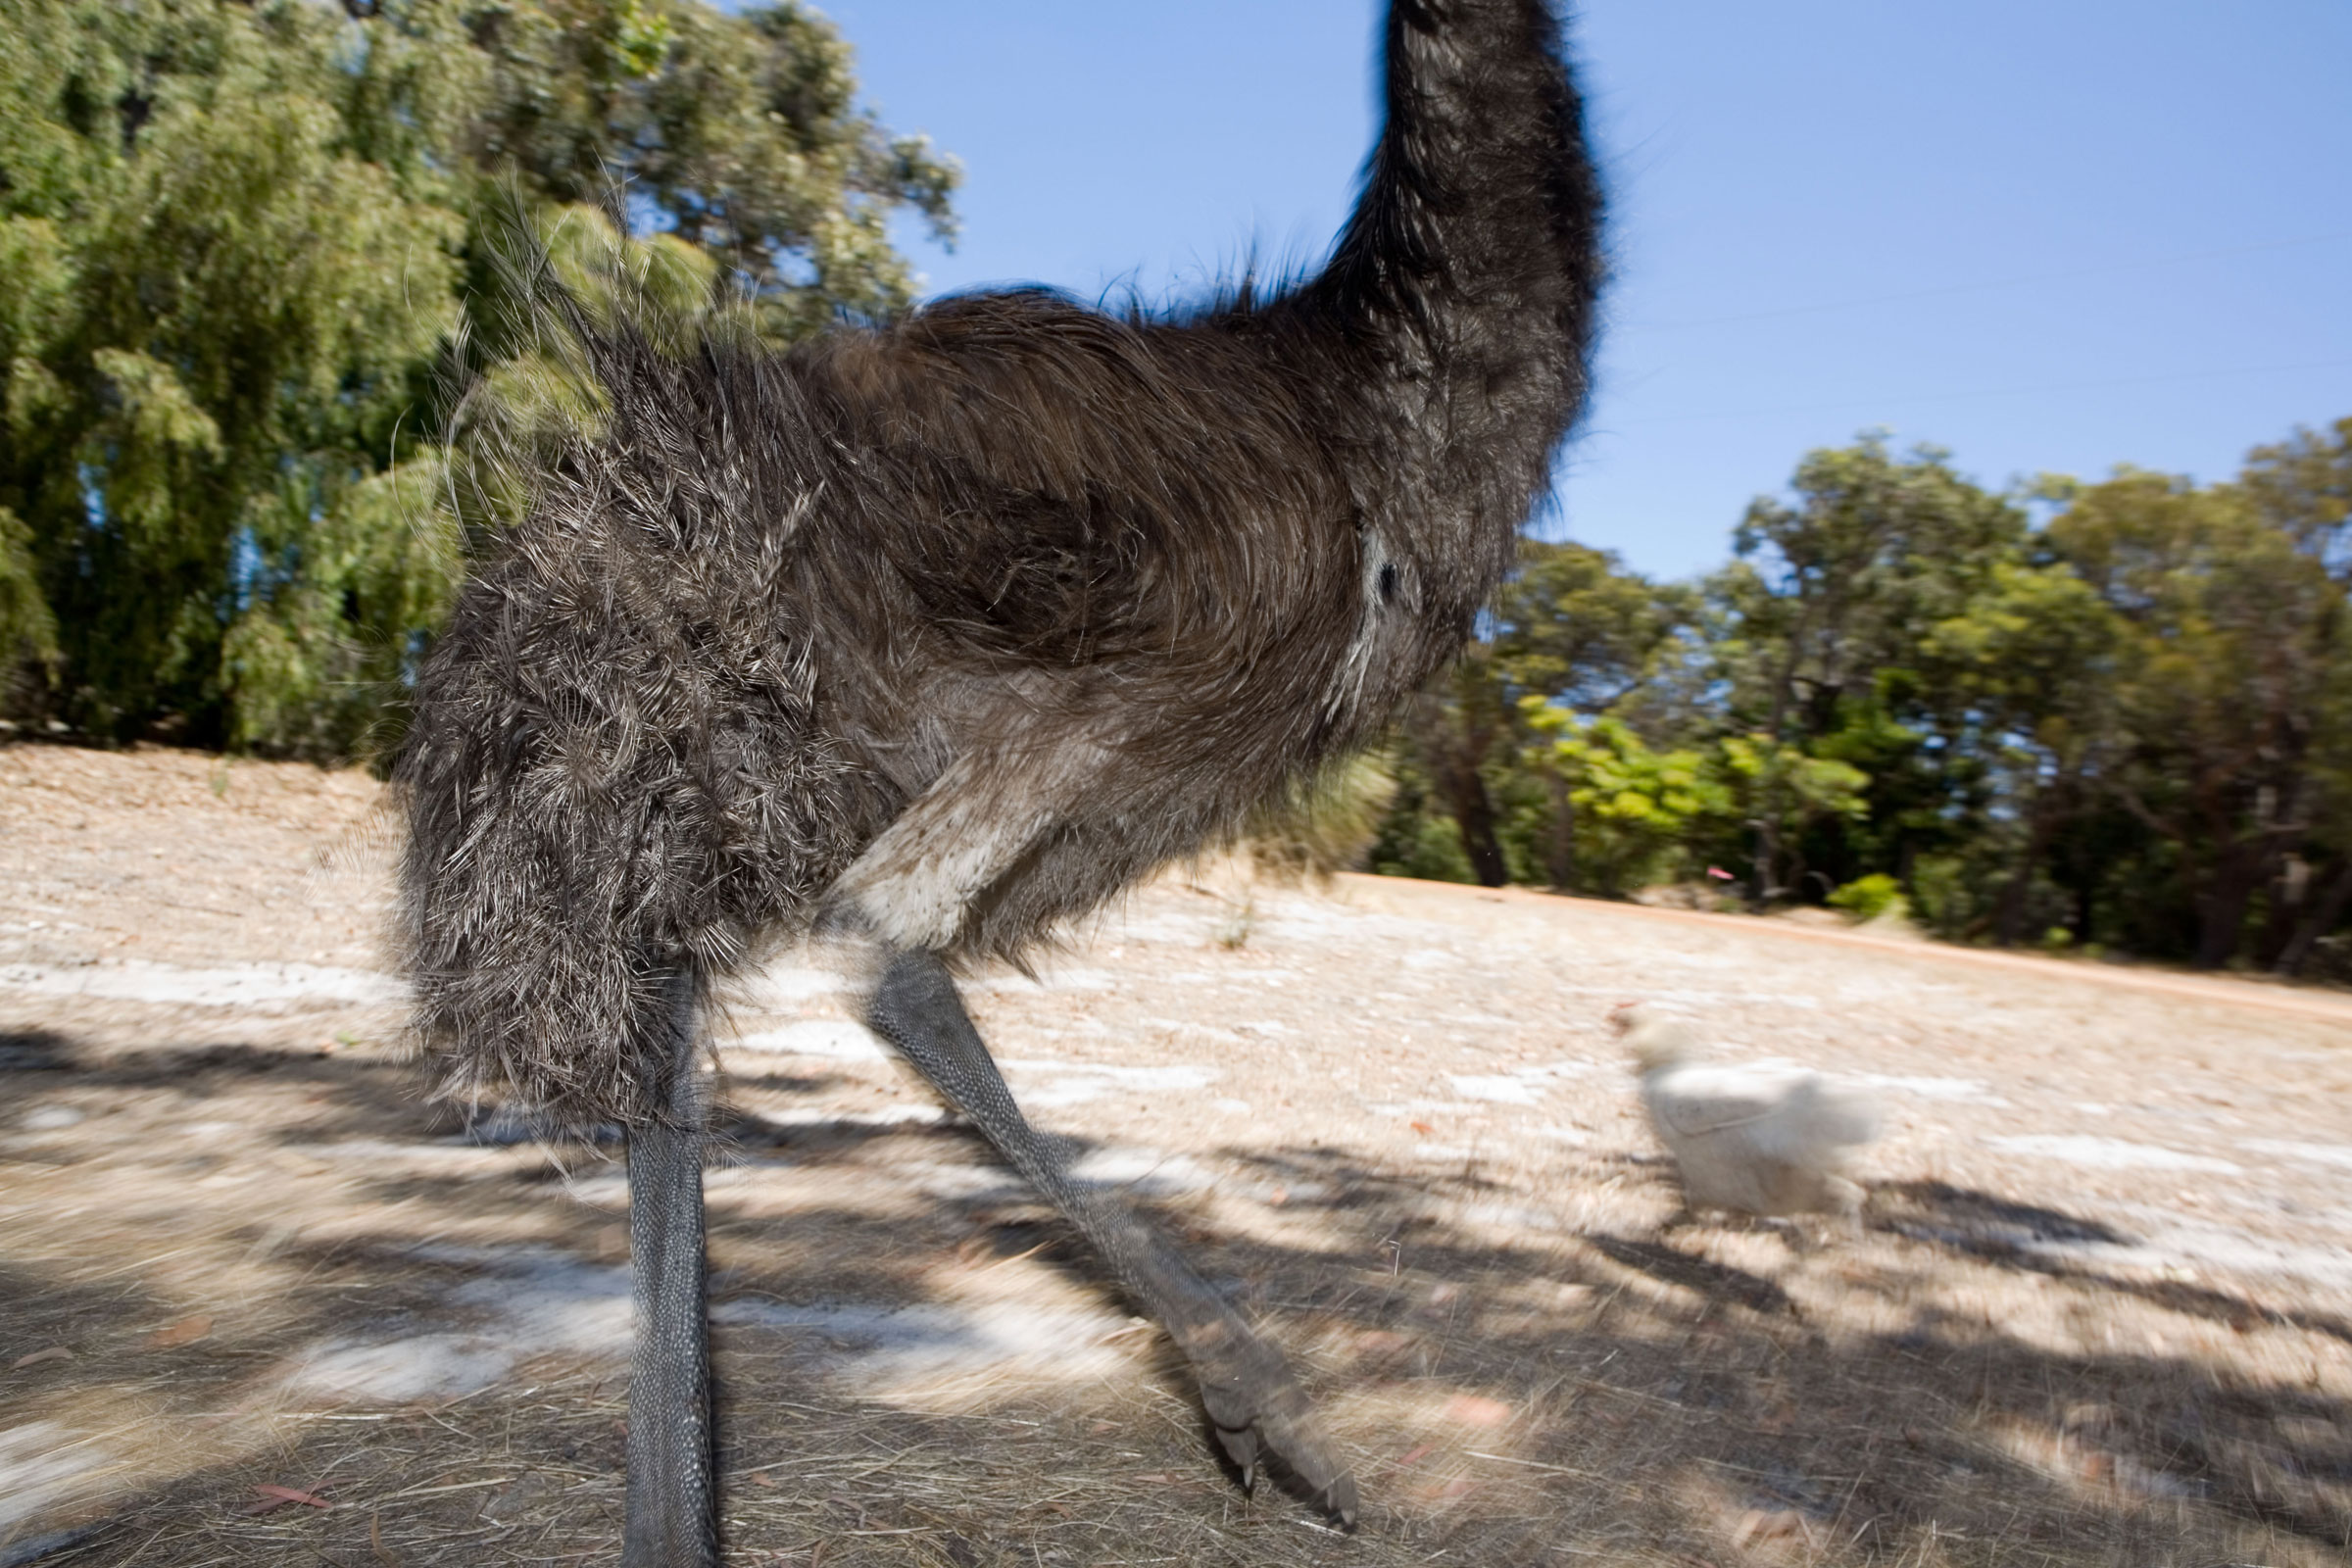 Emu. Dattatreya/Alamy